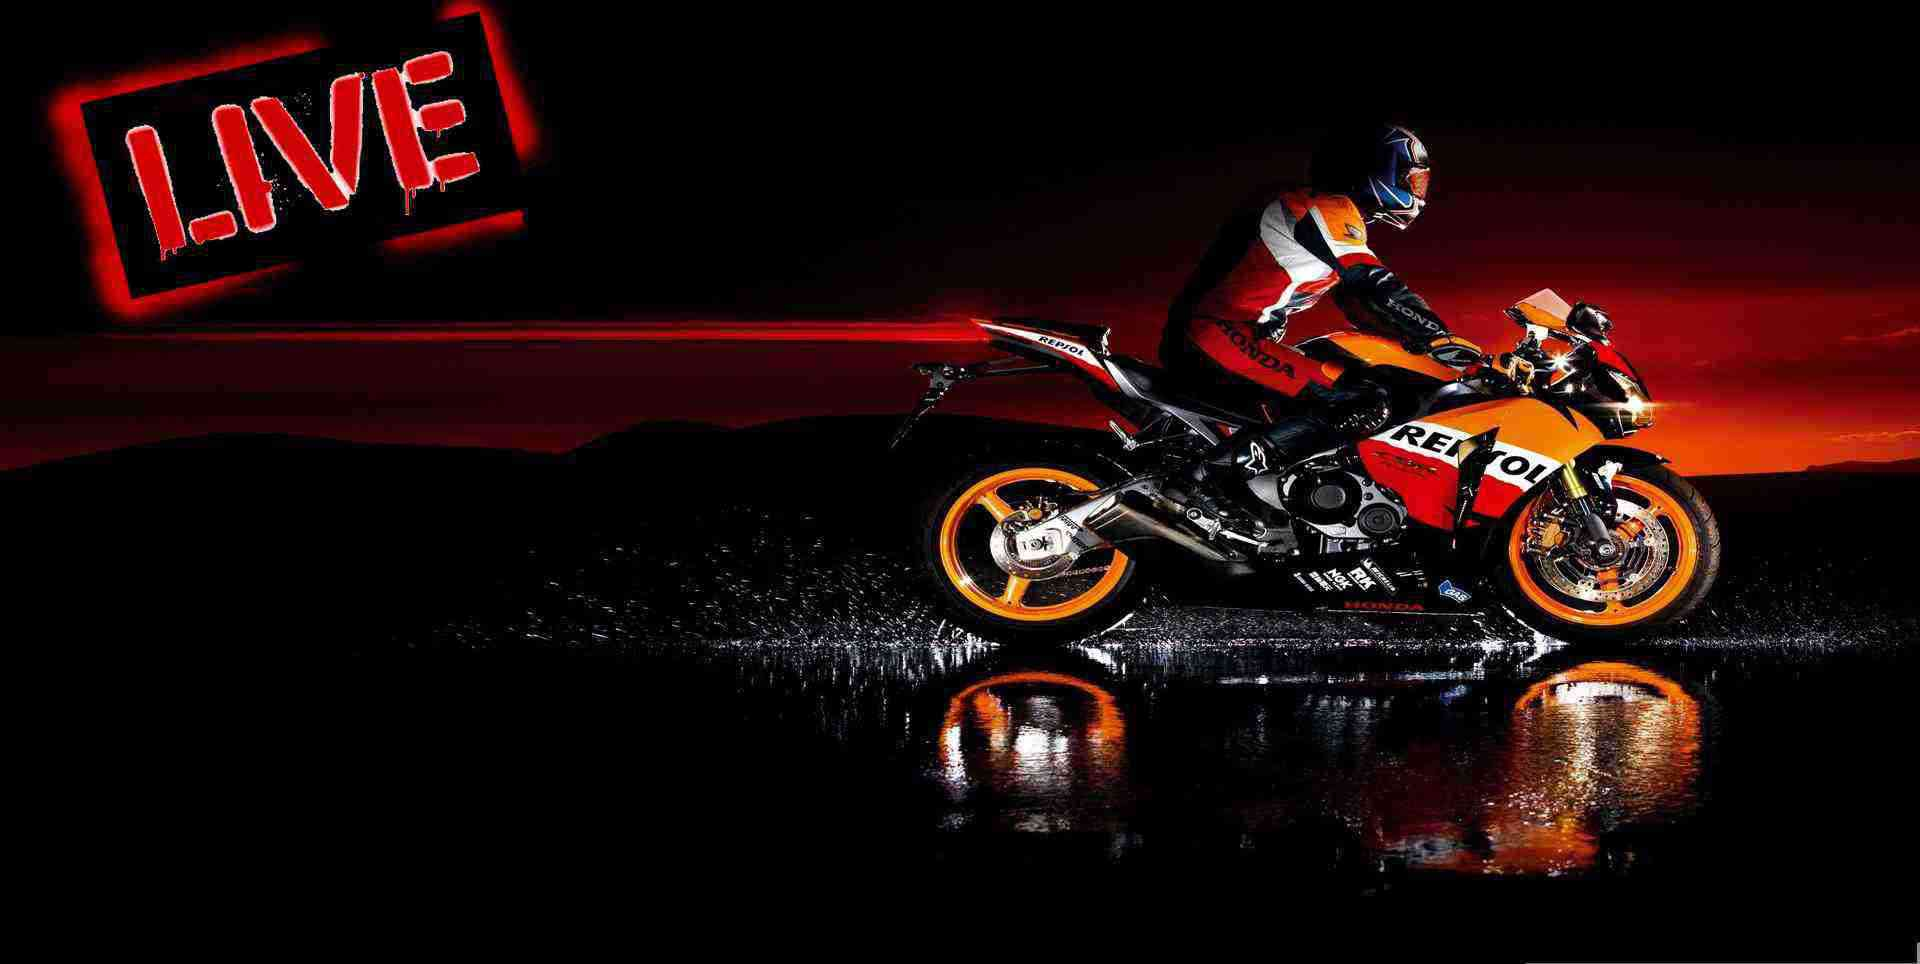 2018 Malaysia MotoGP Live Stream